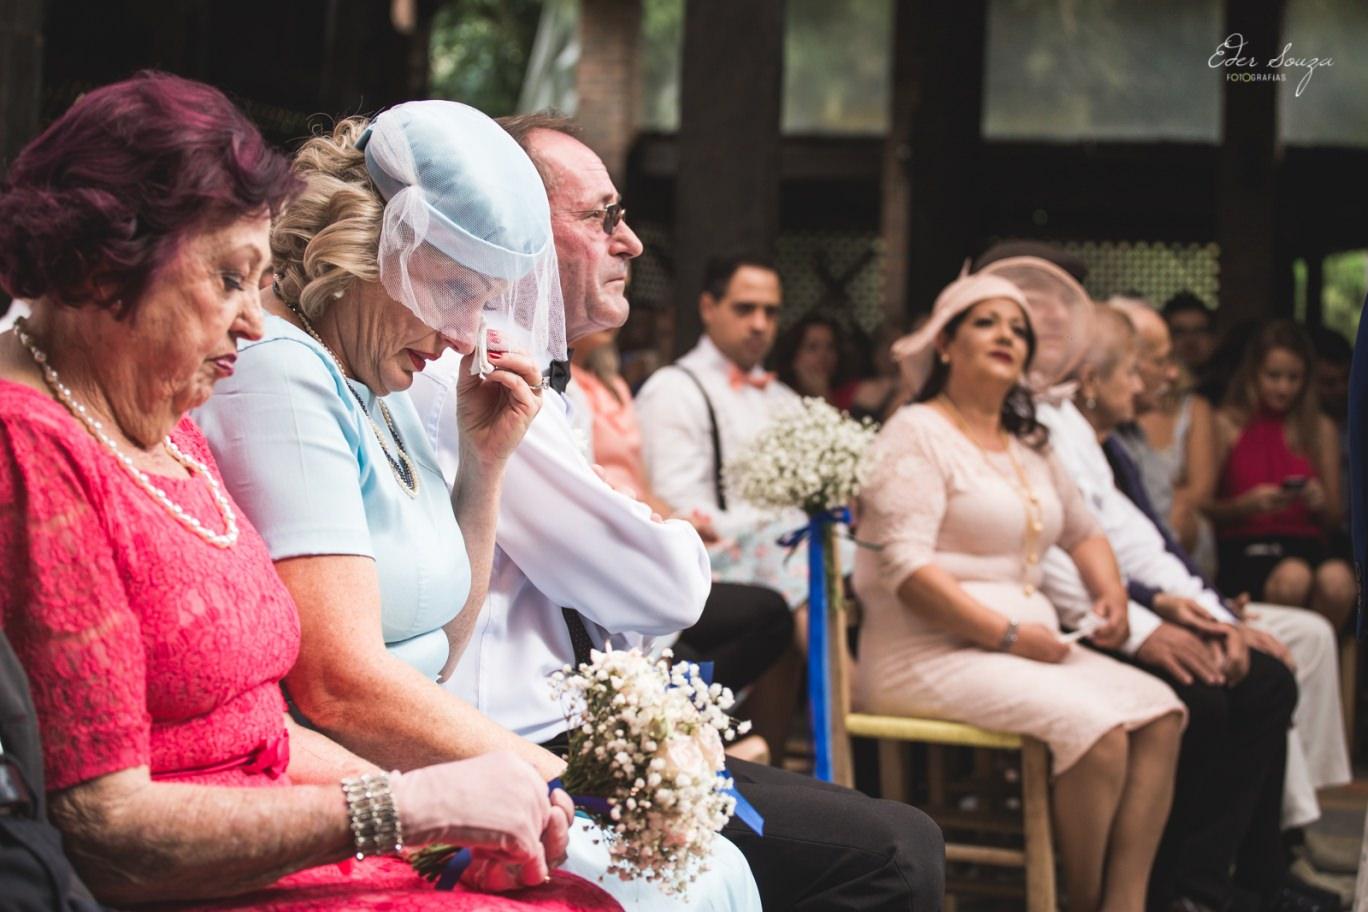 fotografo de casamento blumenau